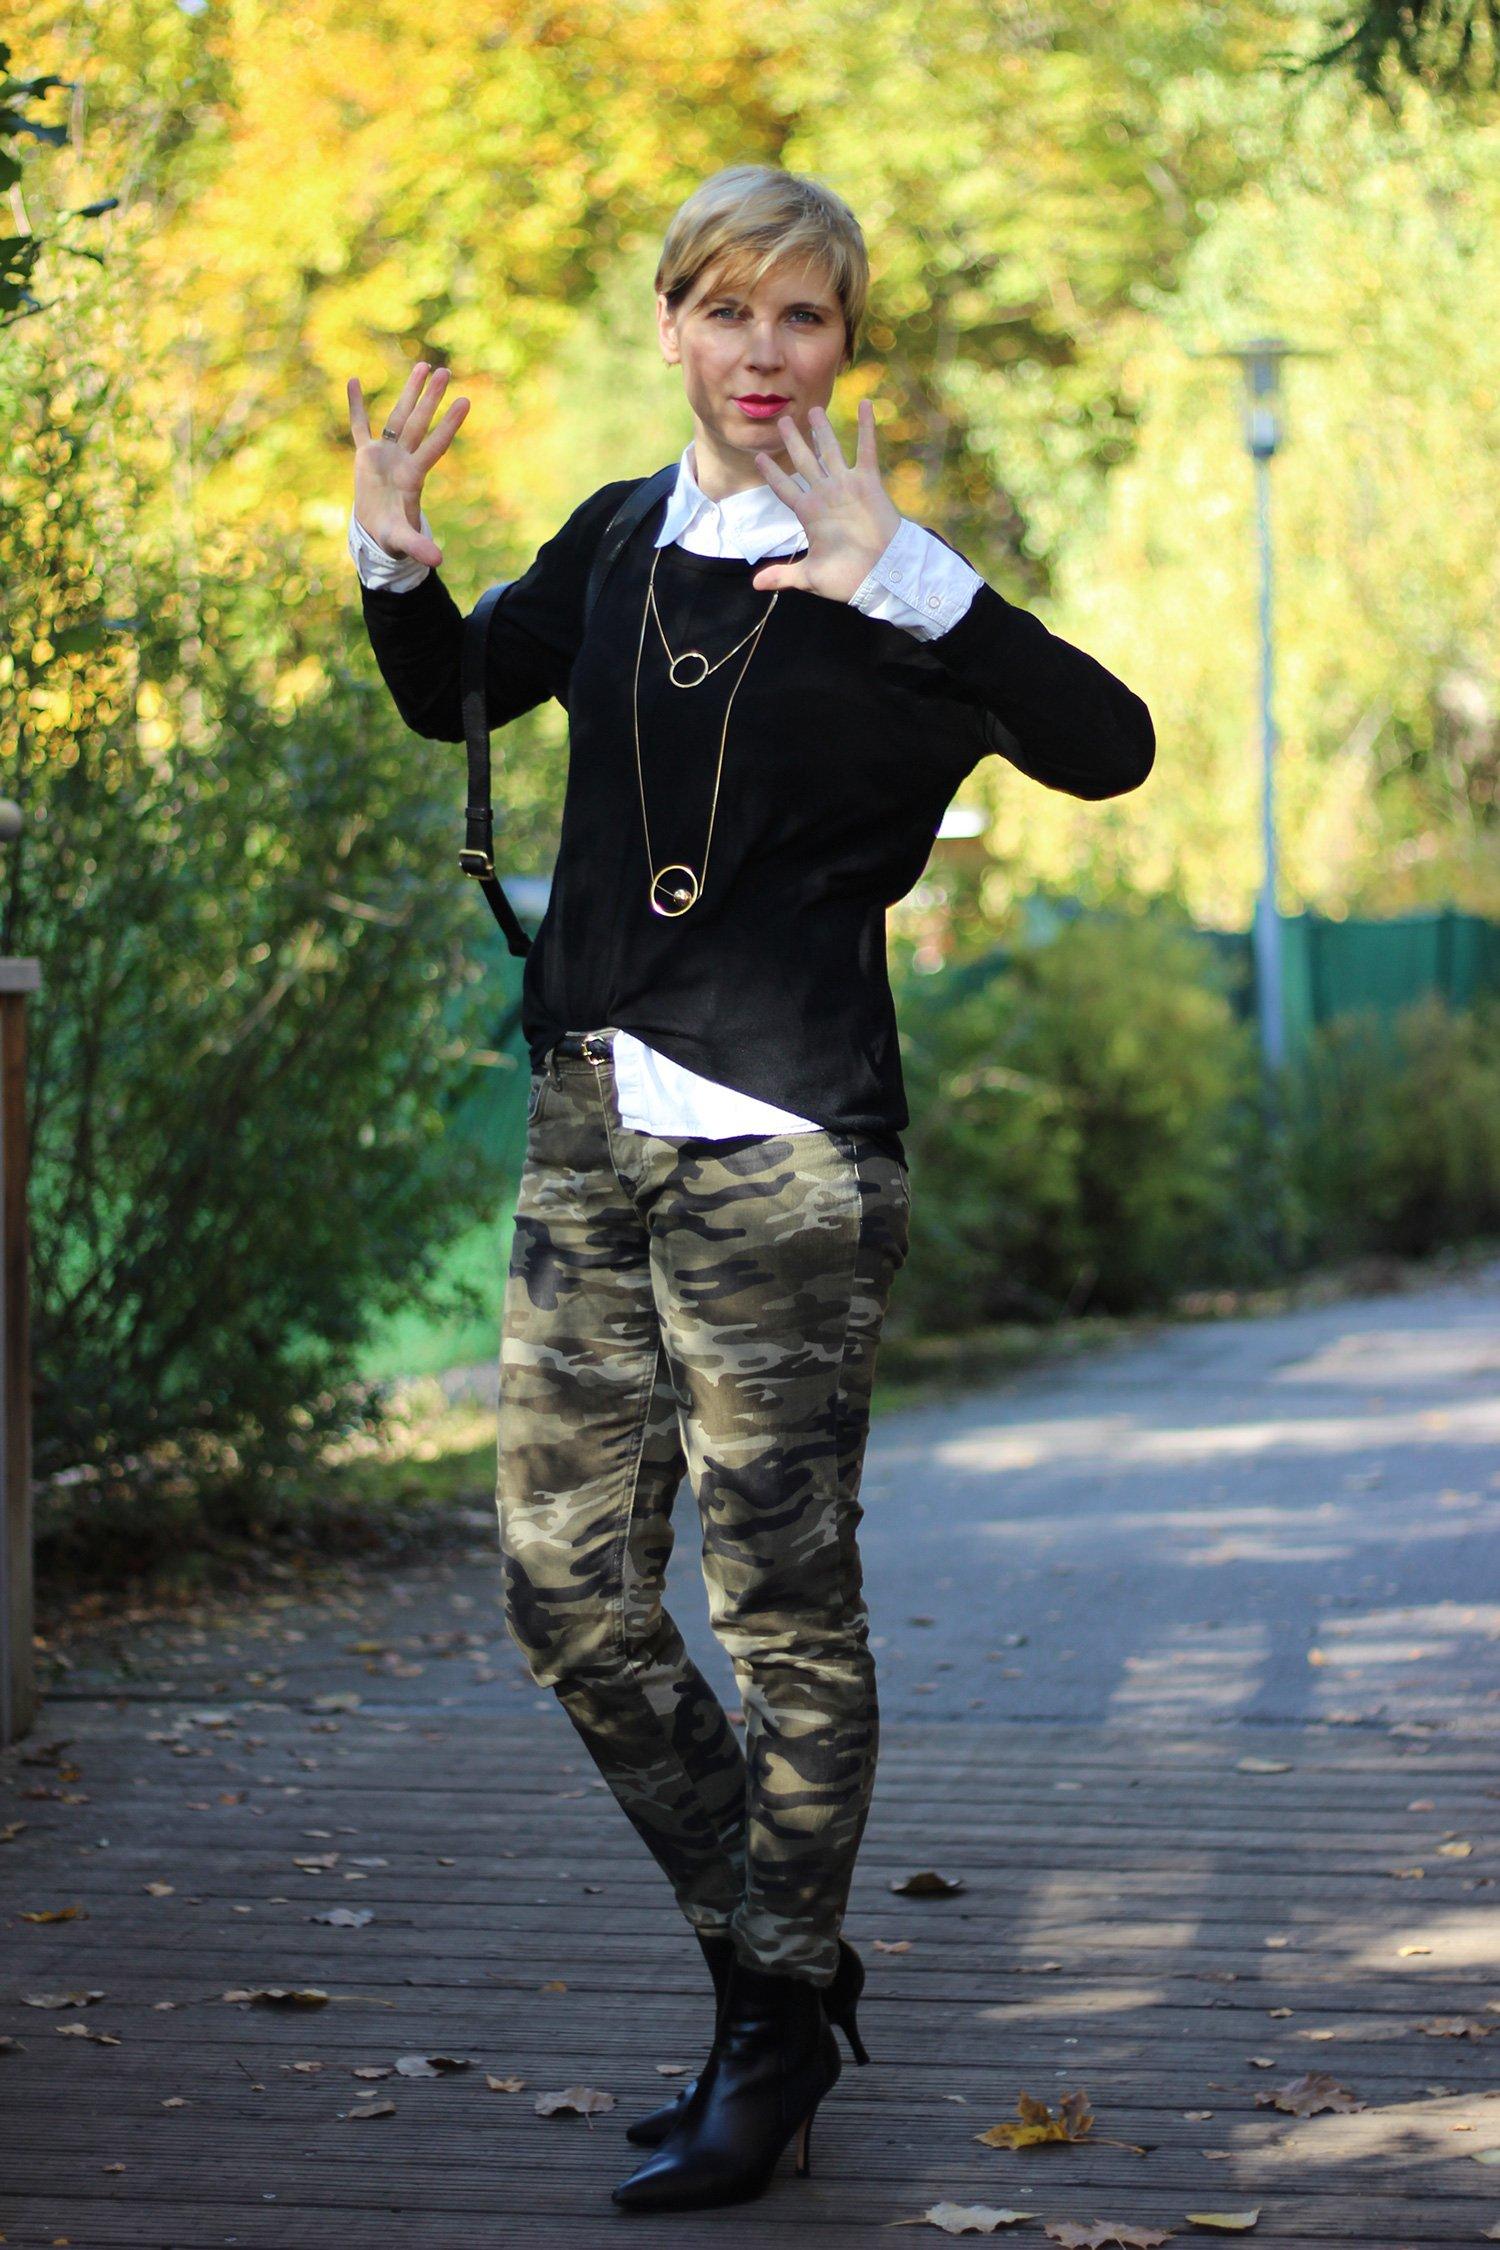 IMG_5356a_Camouflage_Set_ConnyDoll_AHemadundahos_H&M_Pulli_Espritbluse_schwarzweiß_Blackandwhite_Rucksack_DuneLondon_Gold_Zarakette